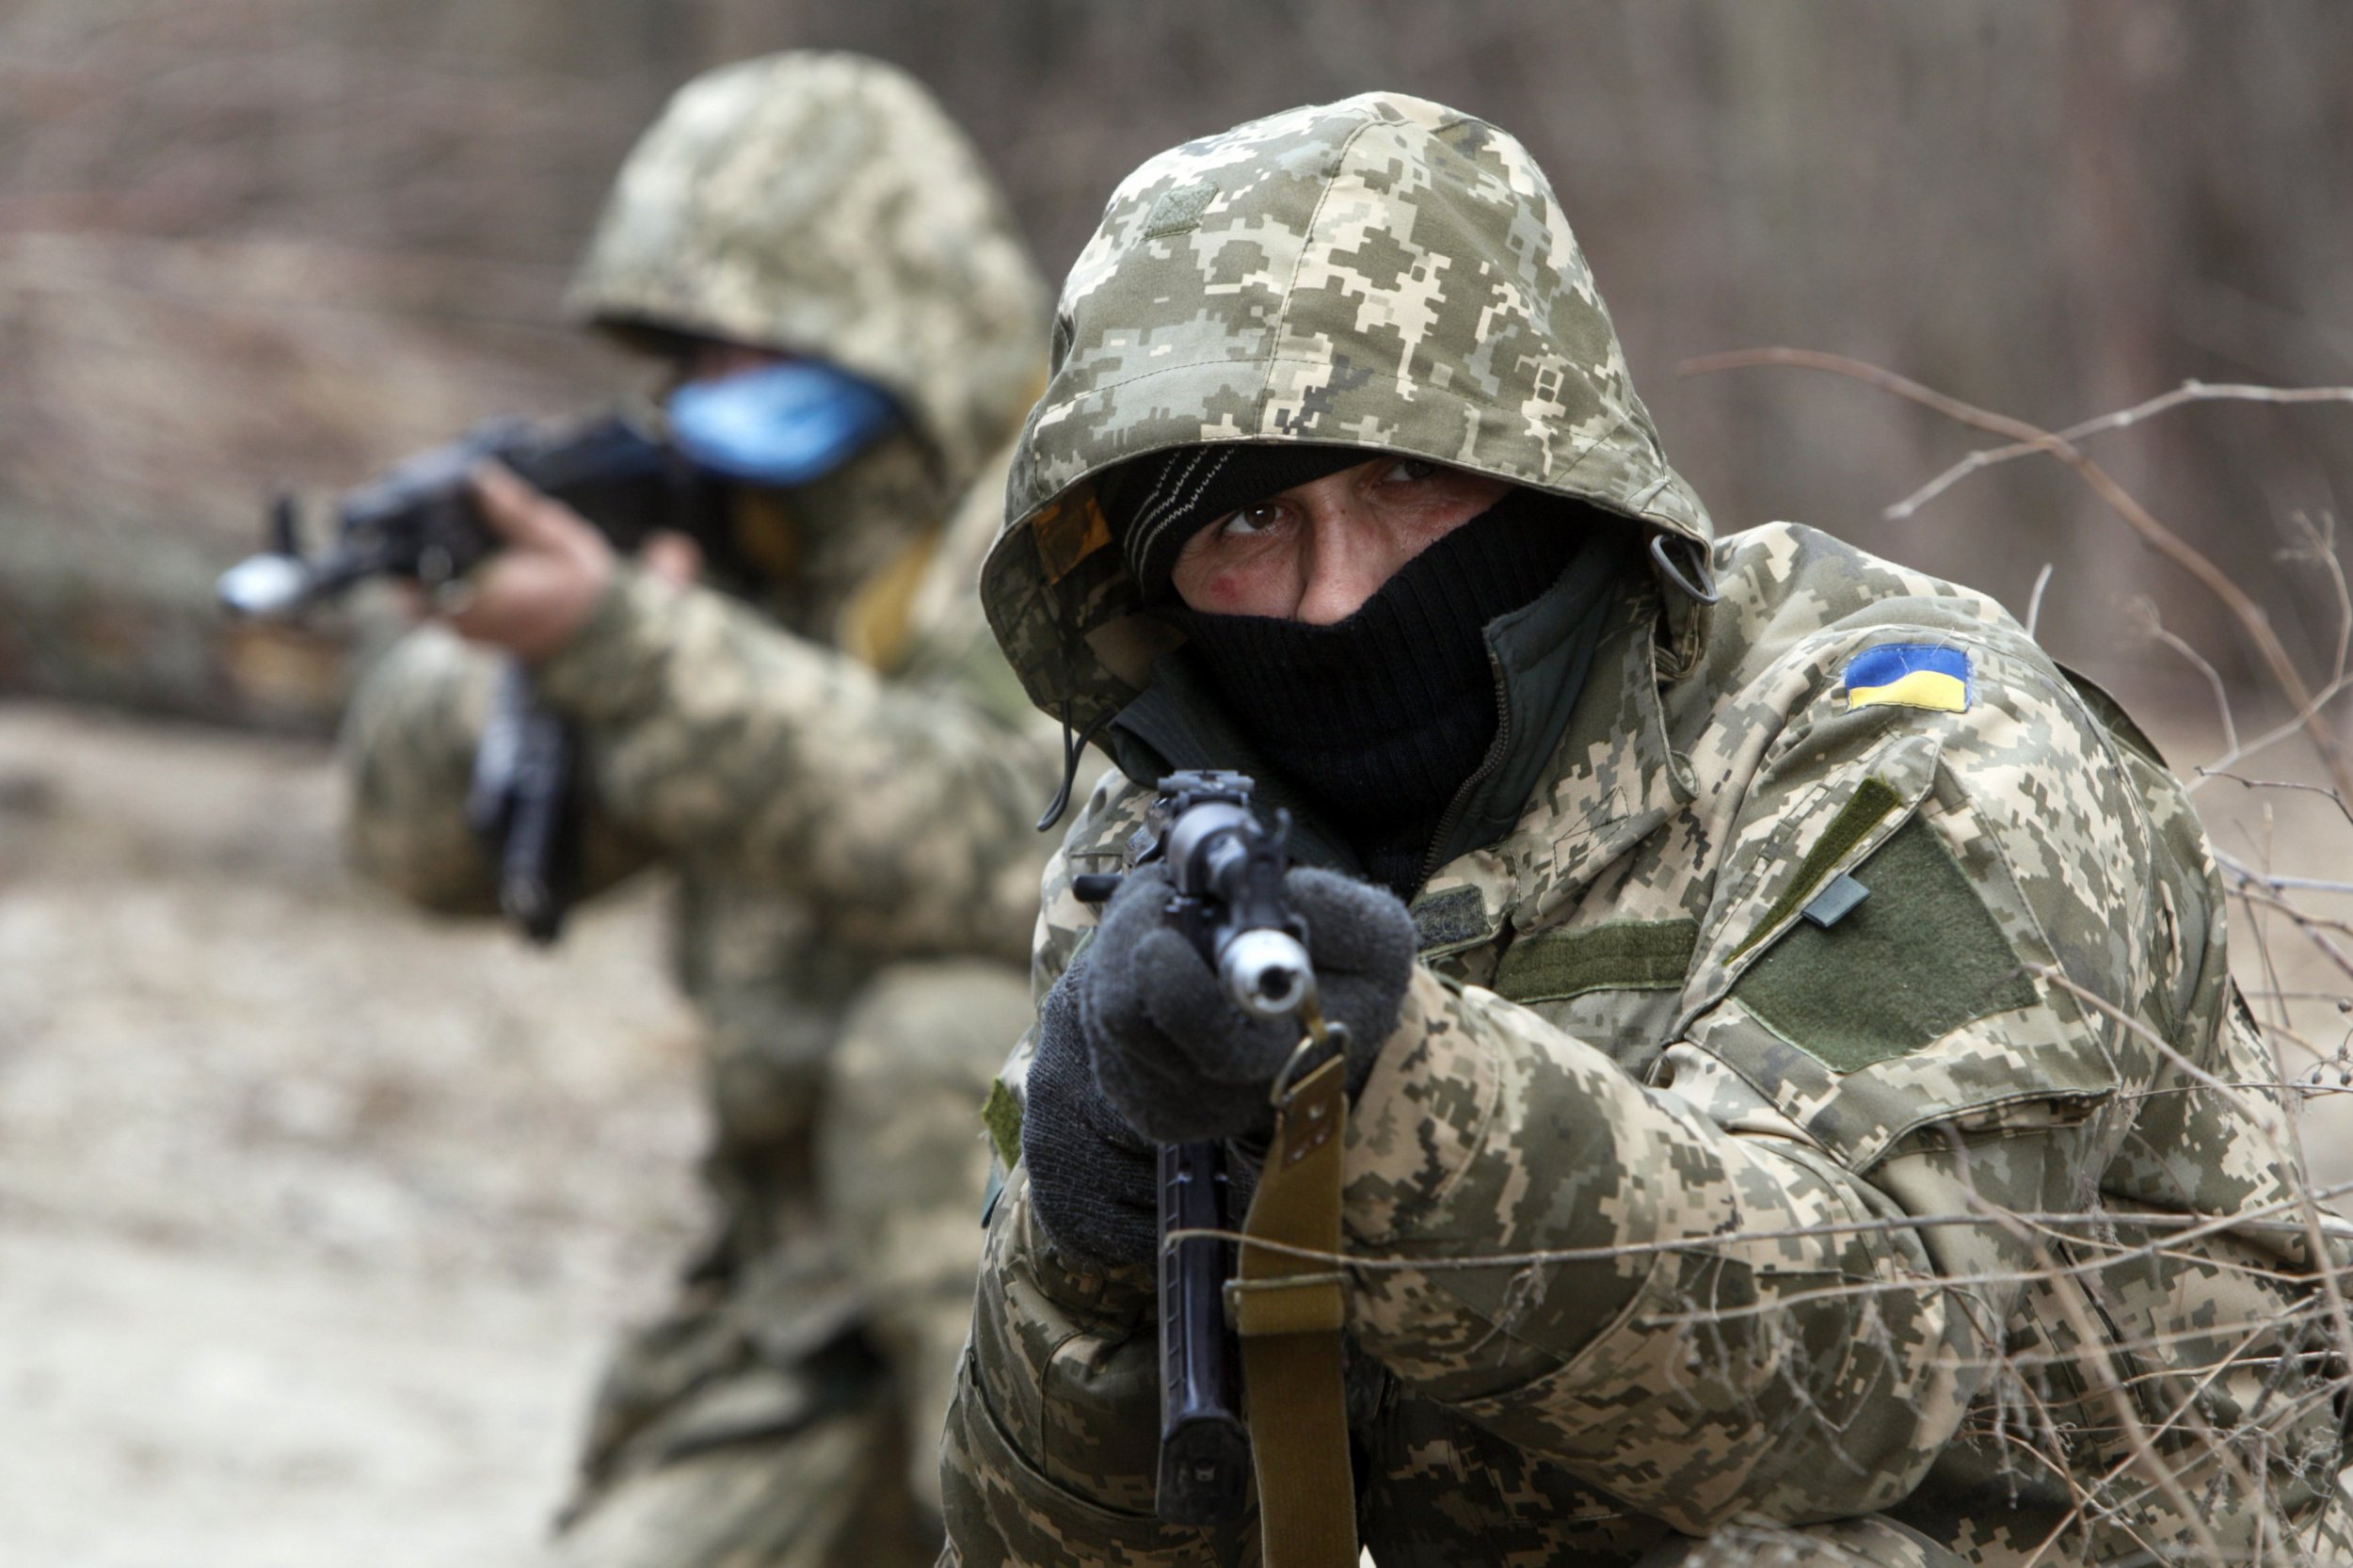 2015-03-06T173434Z_1754767284_GM1EB37049701_RTRMADP_3_UKRAINE-CRISIS (1)